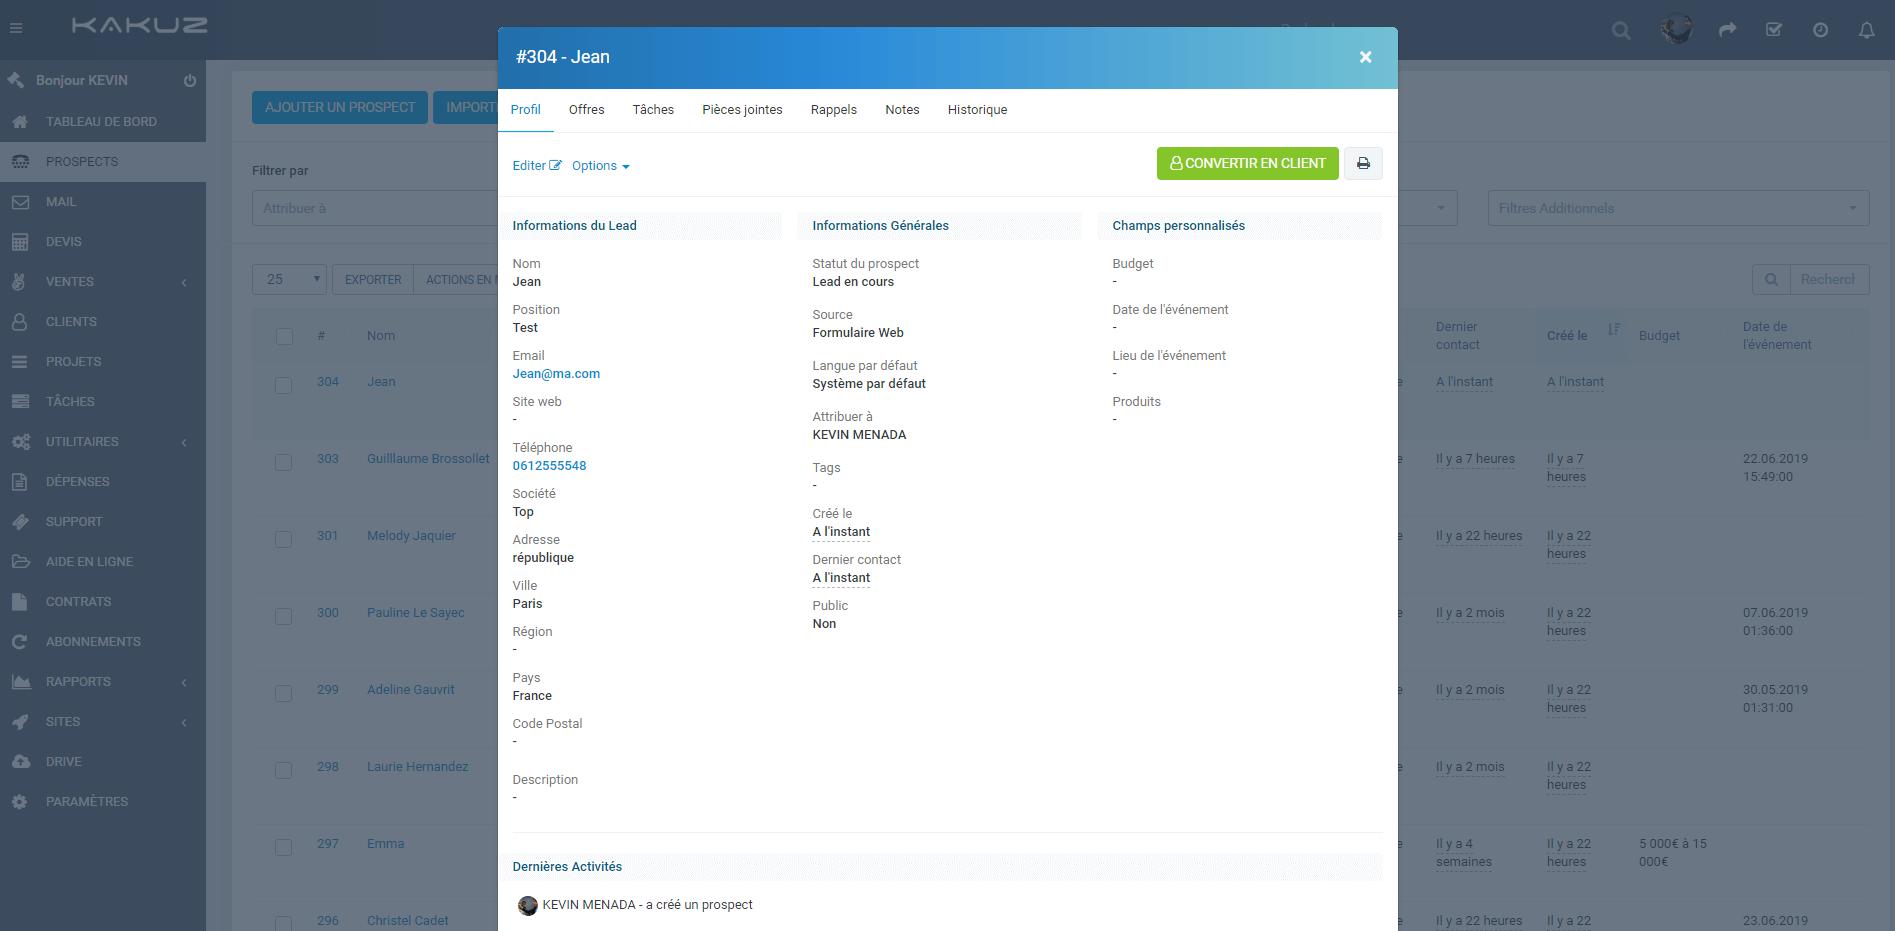 Template focus_keyword} - Fiche client - Startup Crm